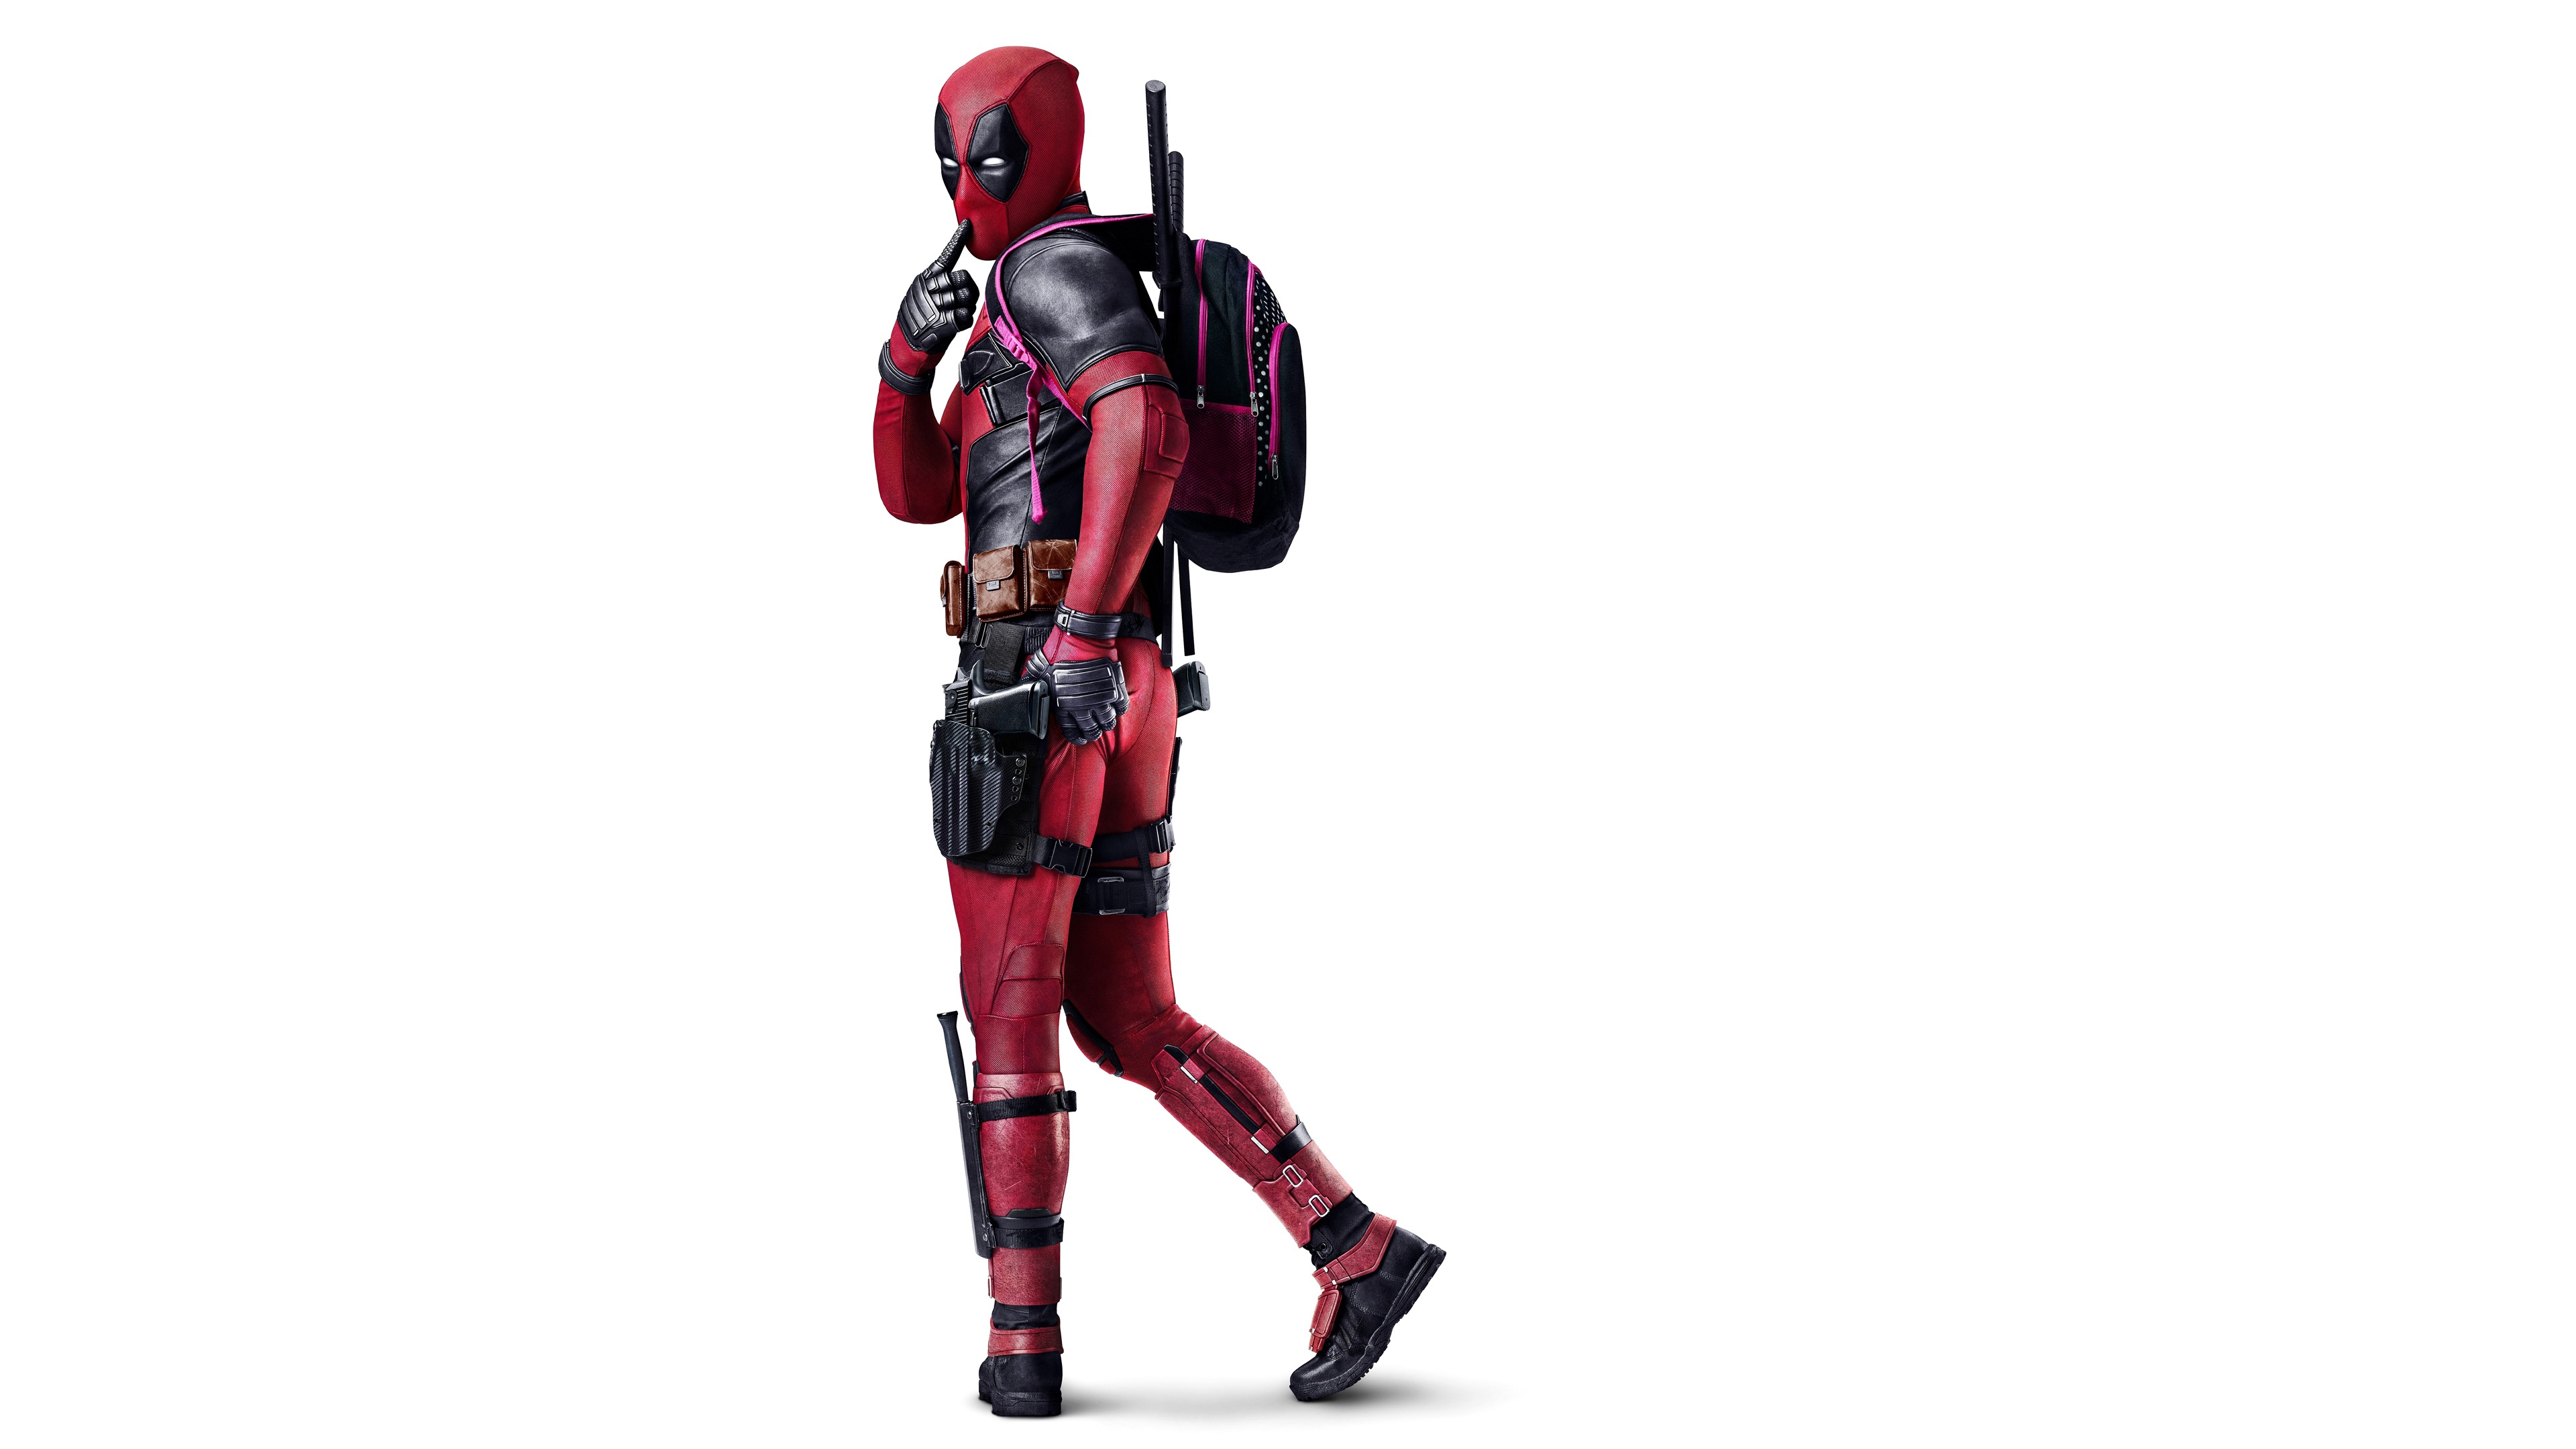 Deadpool 2016 Wallpapers HD Wallpapers 3840x2160